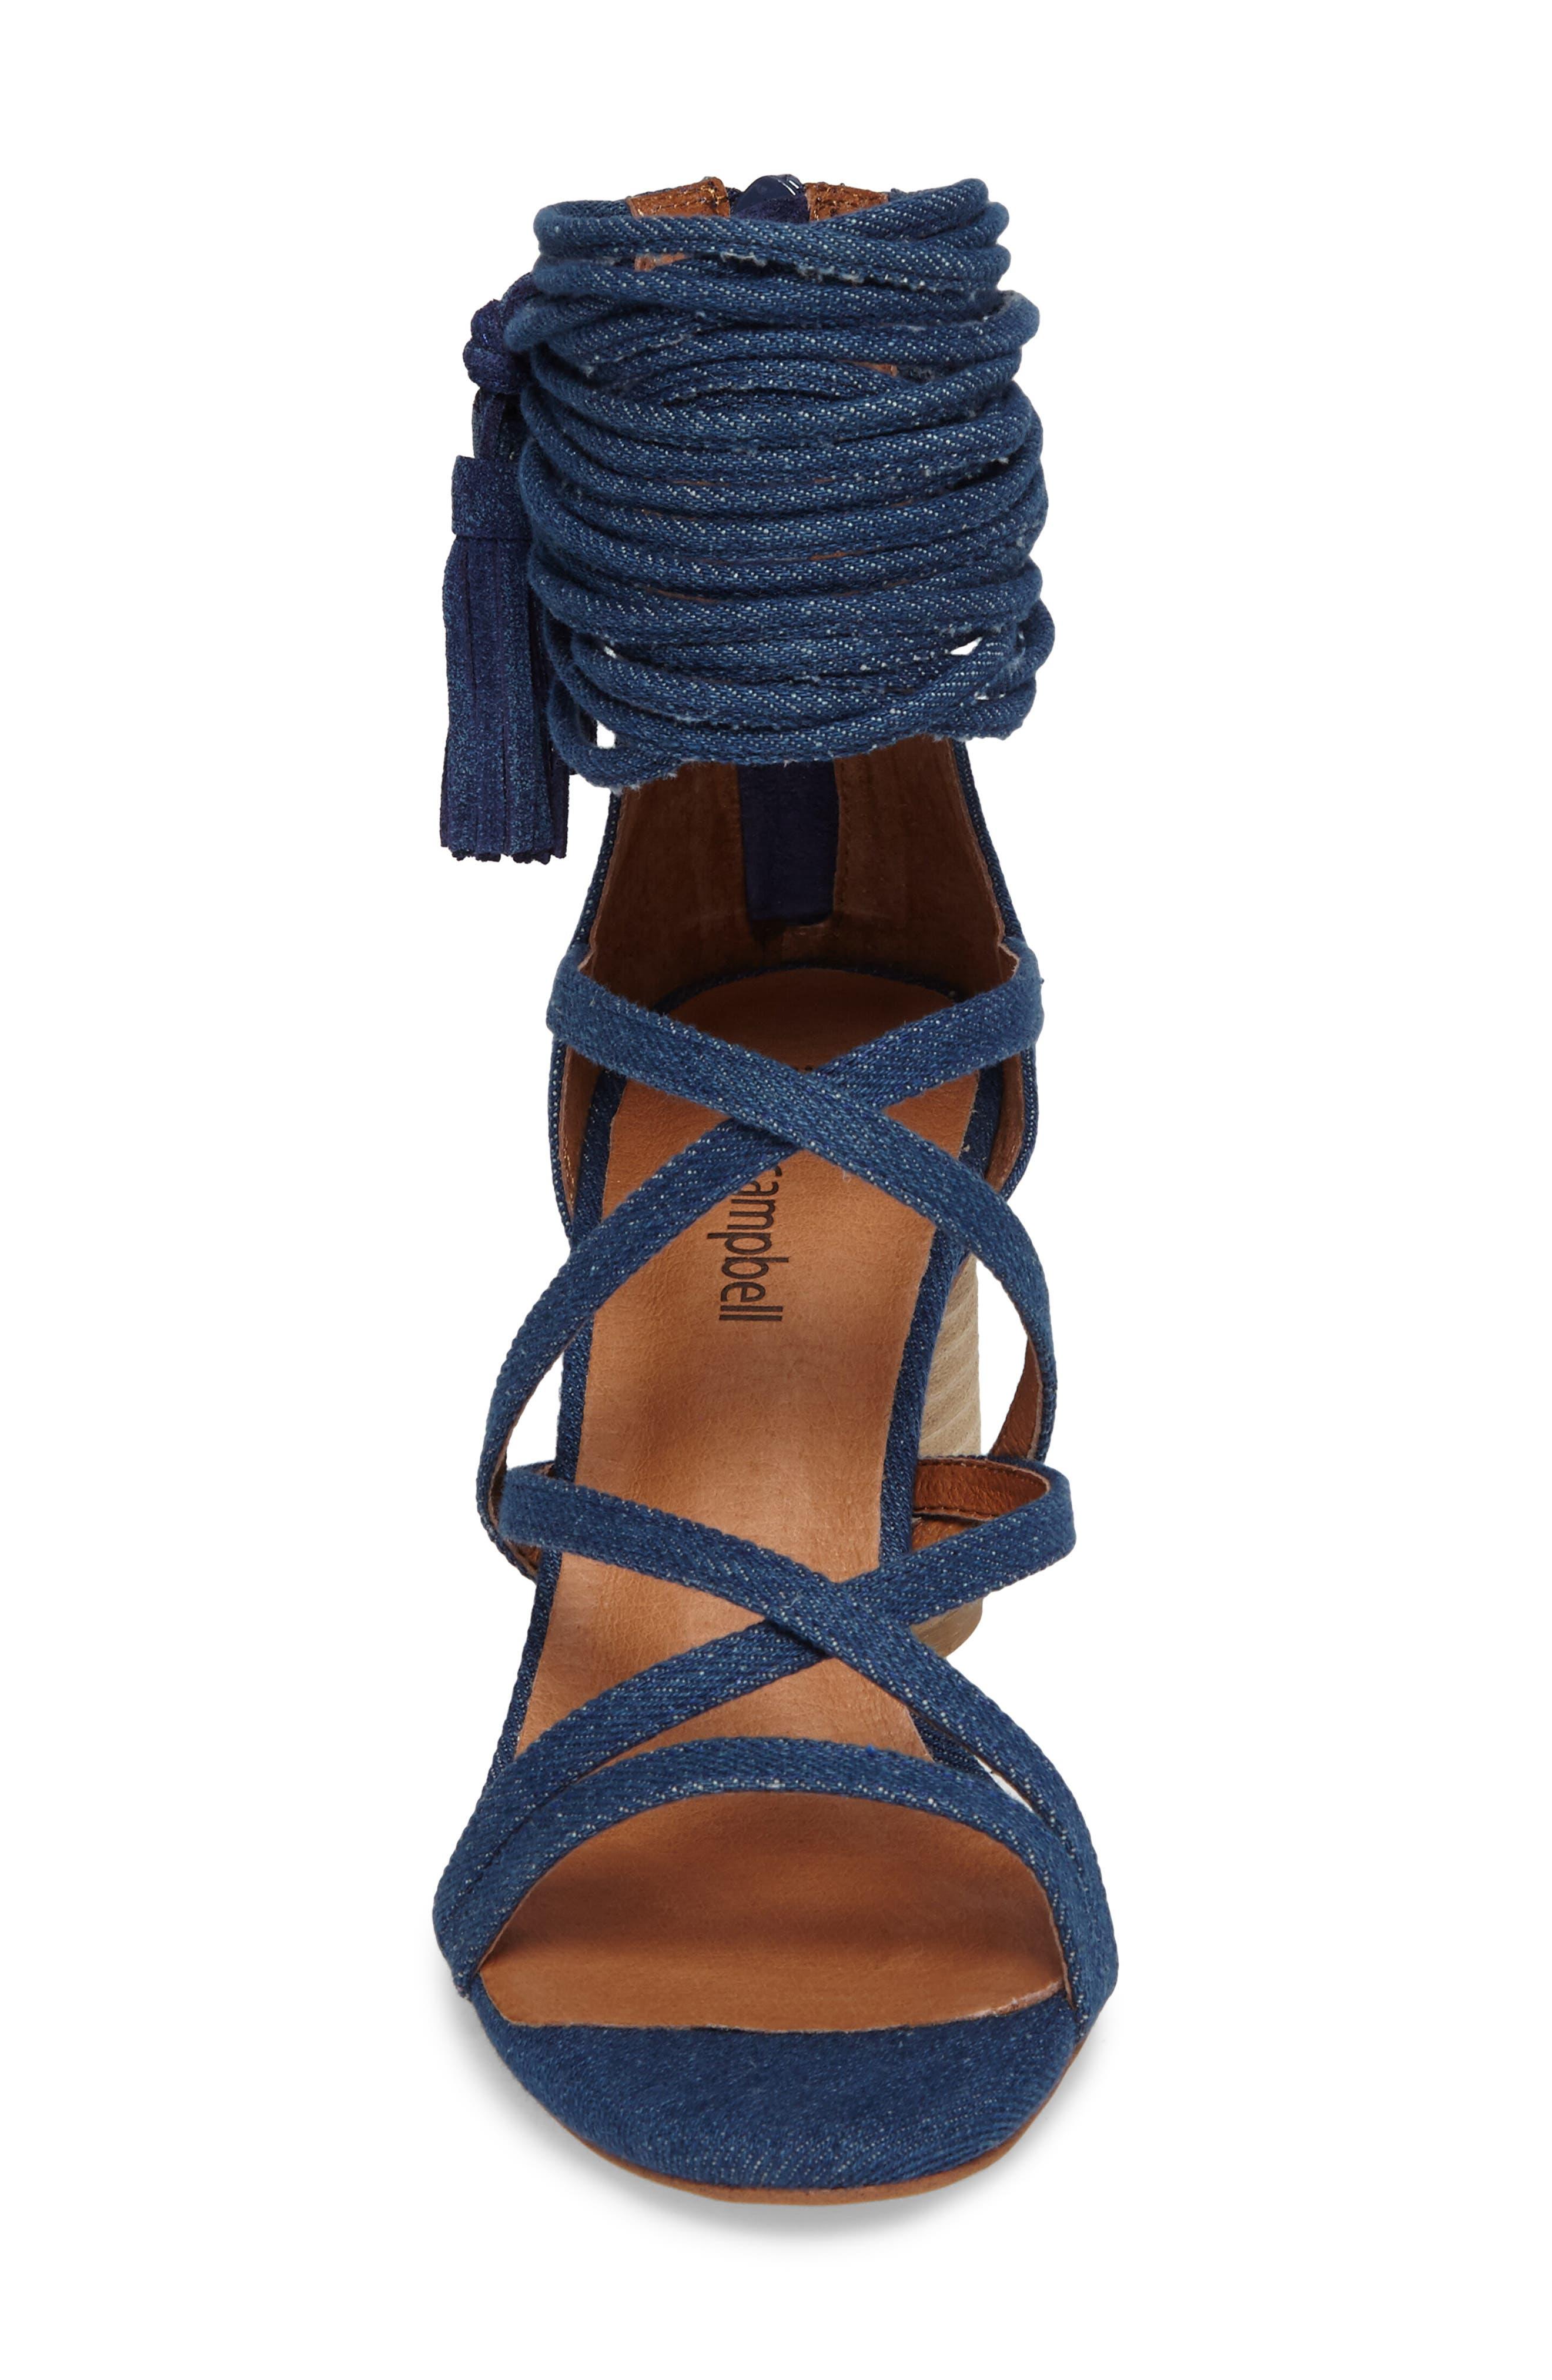 'Despina' Strappy Sandal,                             Alternate thumbnail 27, color,